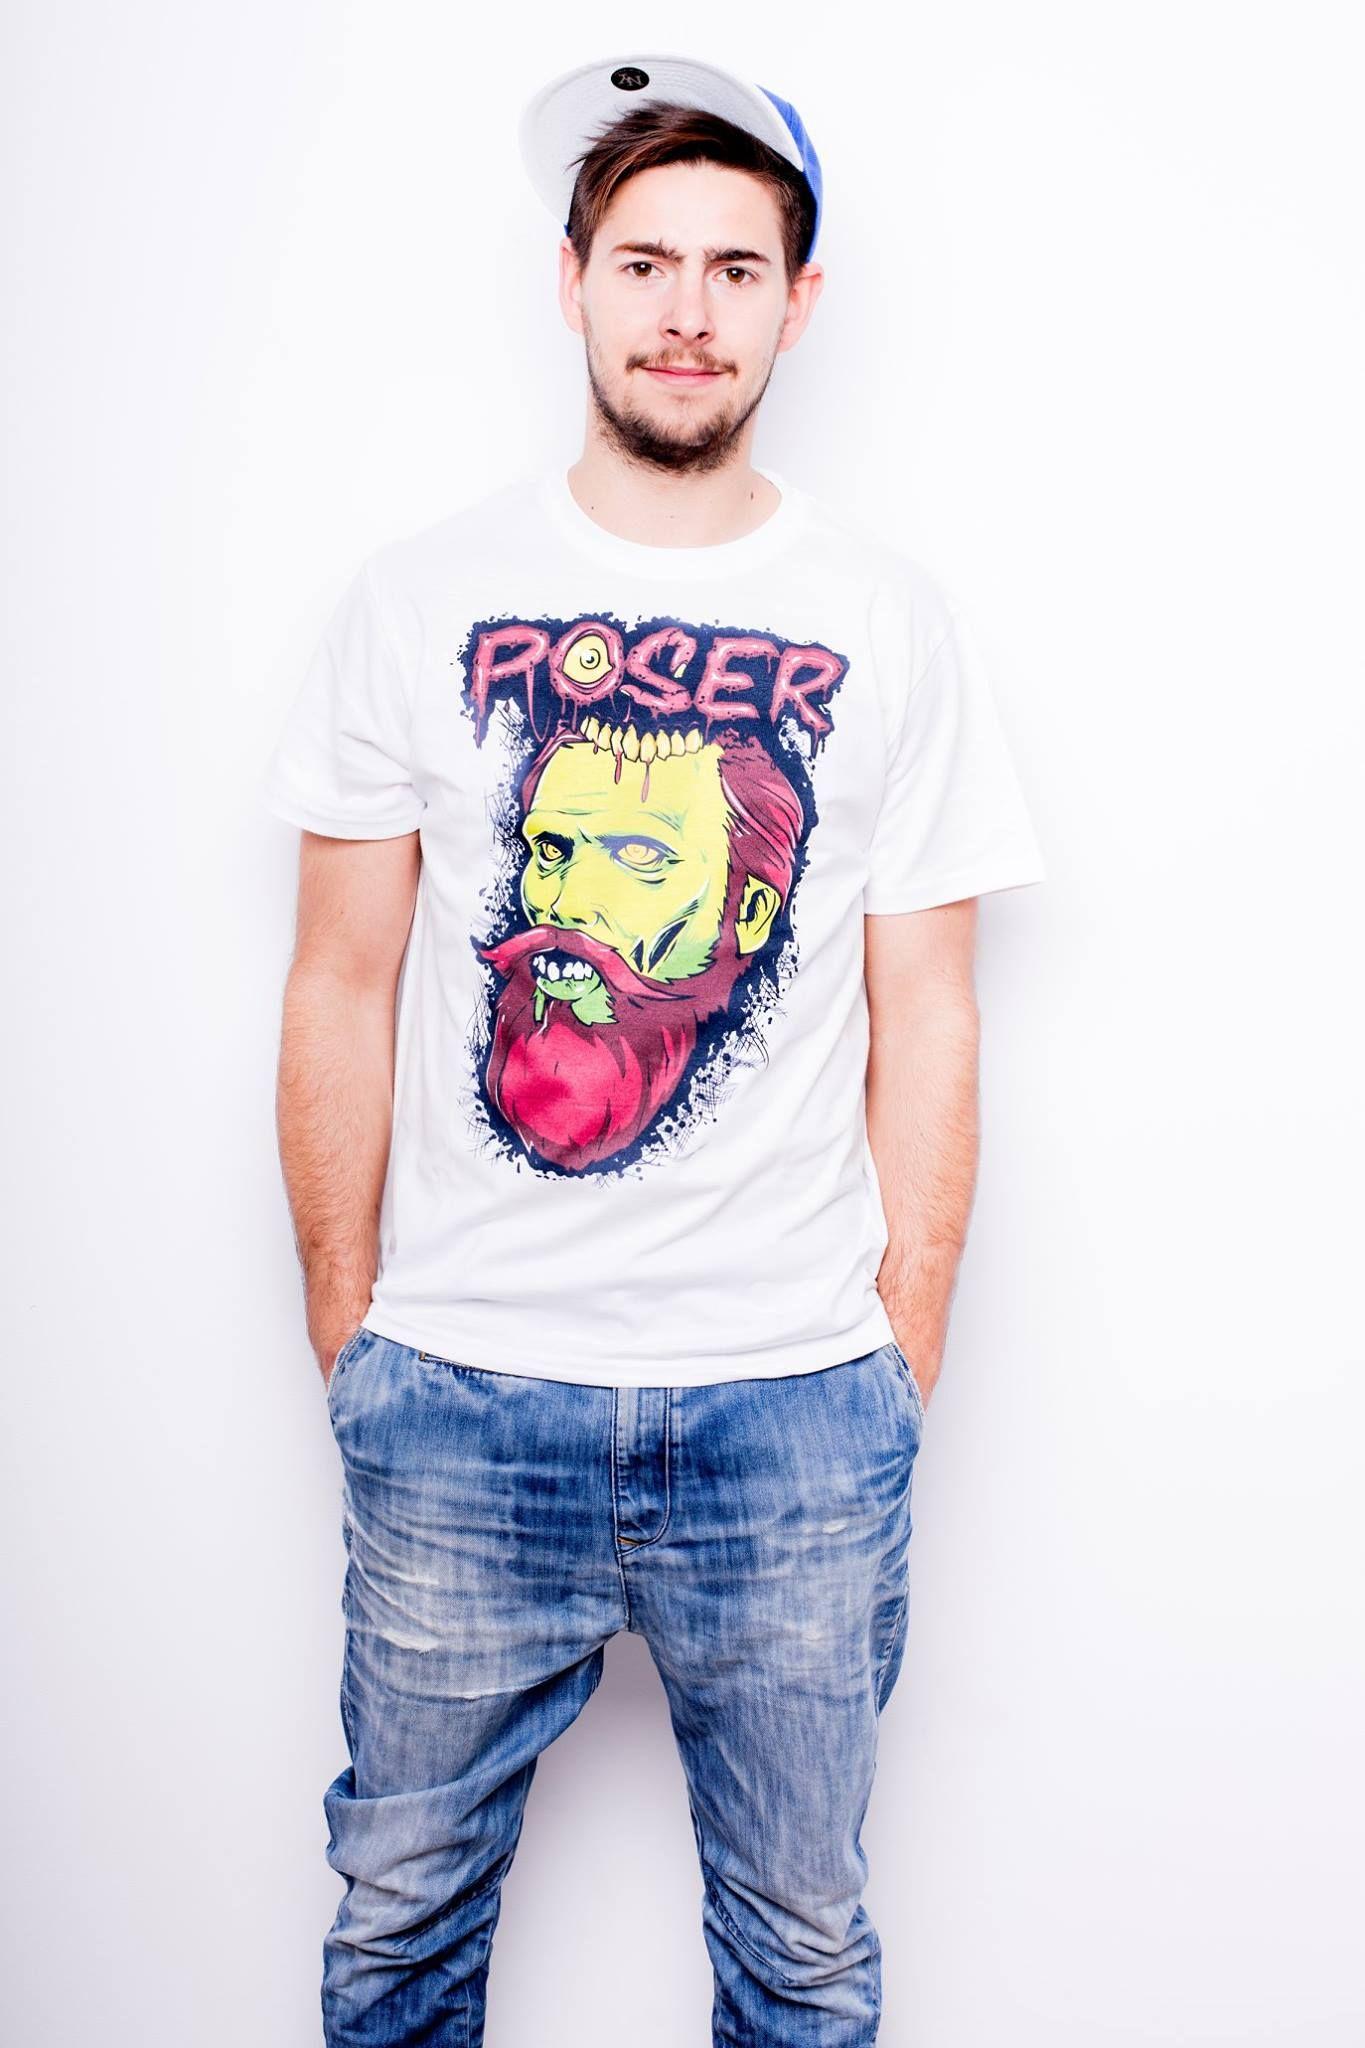 Allbag Nadruki Wadowice Bluza Tshirt Koszulki